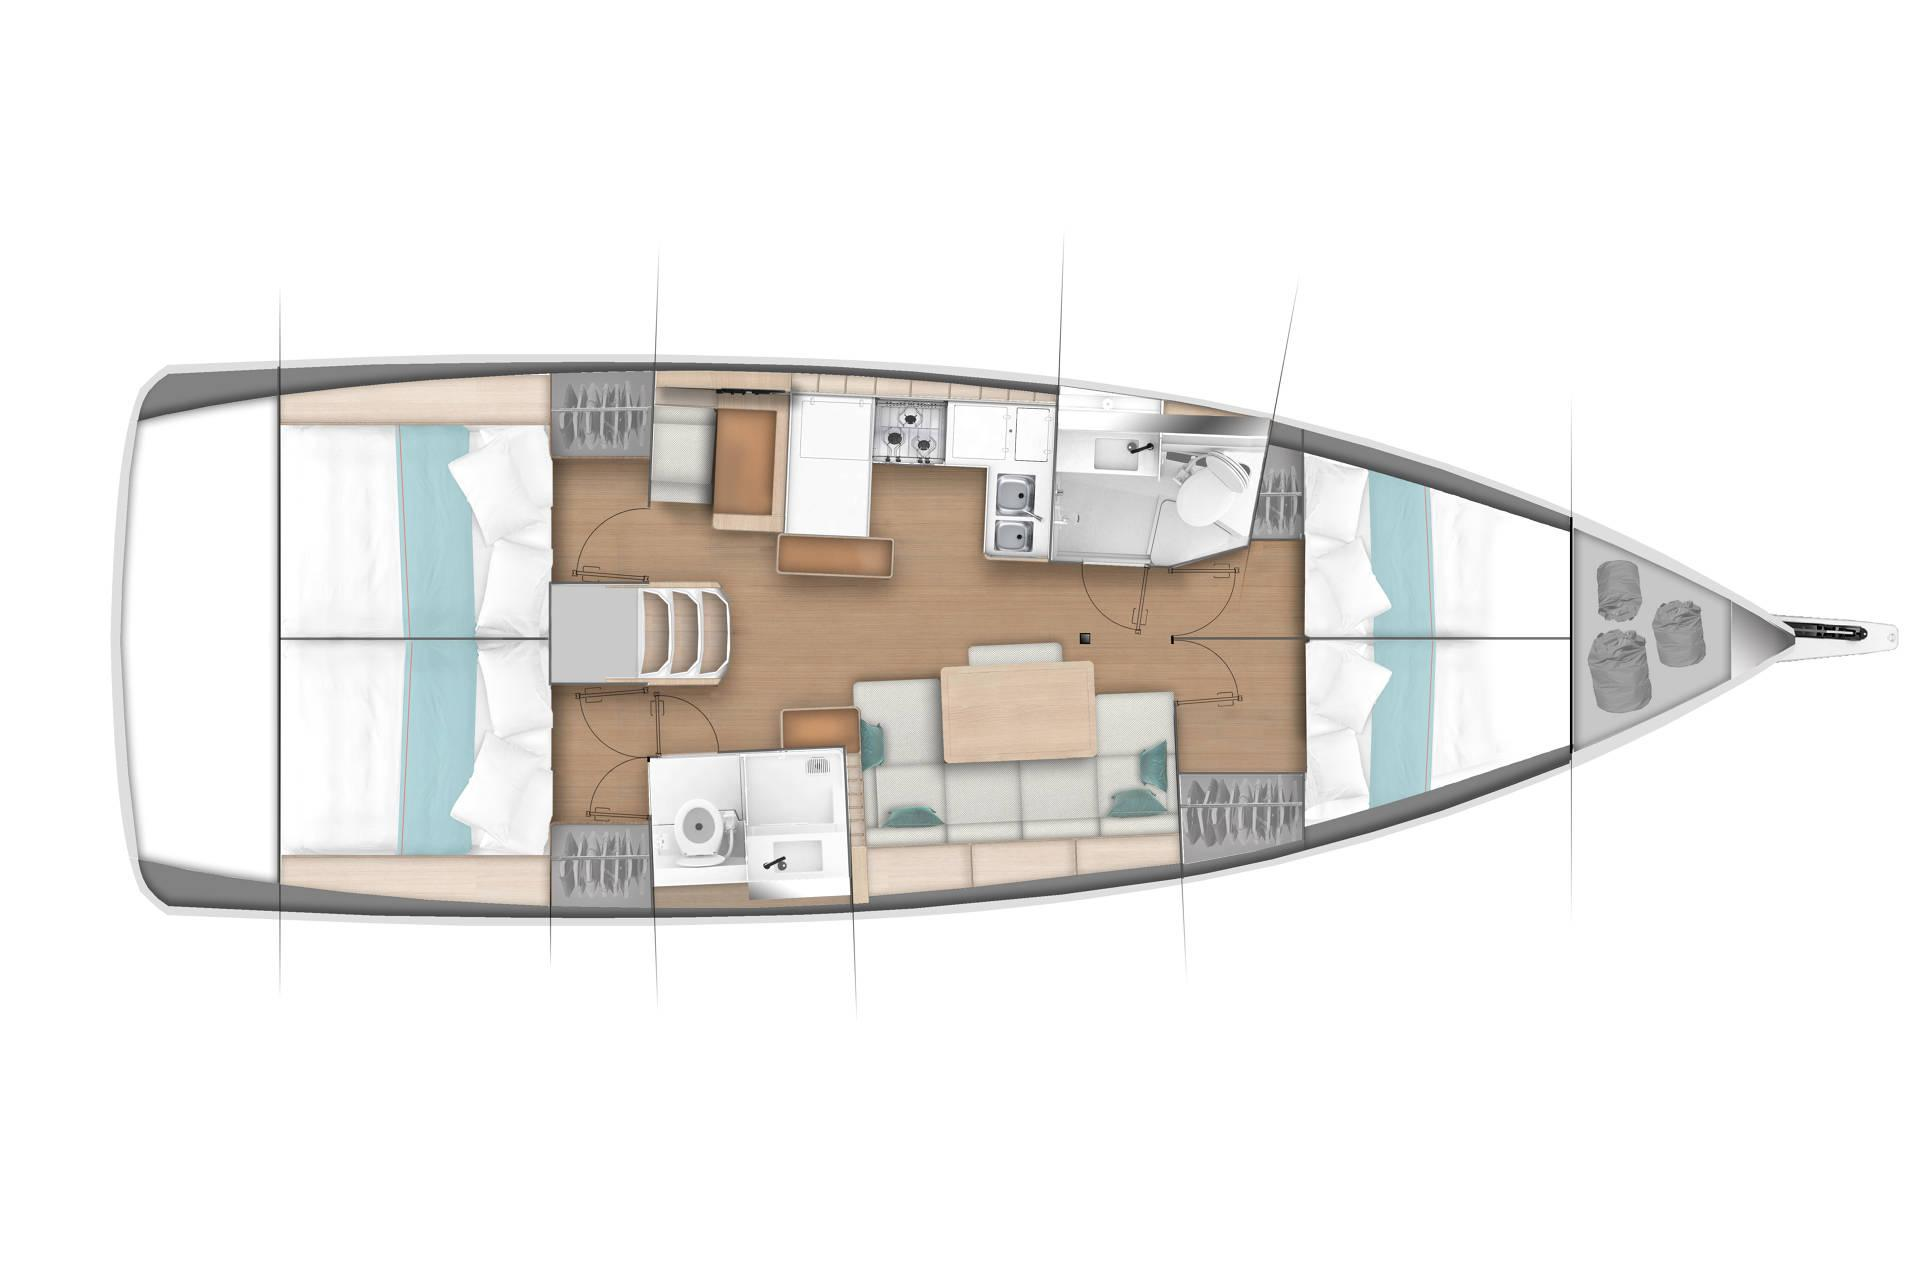 Sun Odyssey 440 - Bareboat charteting in Paros - Plan (1)